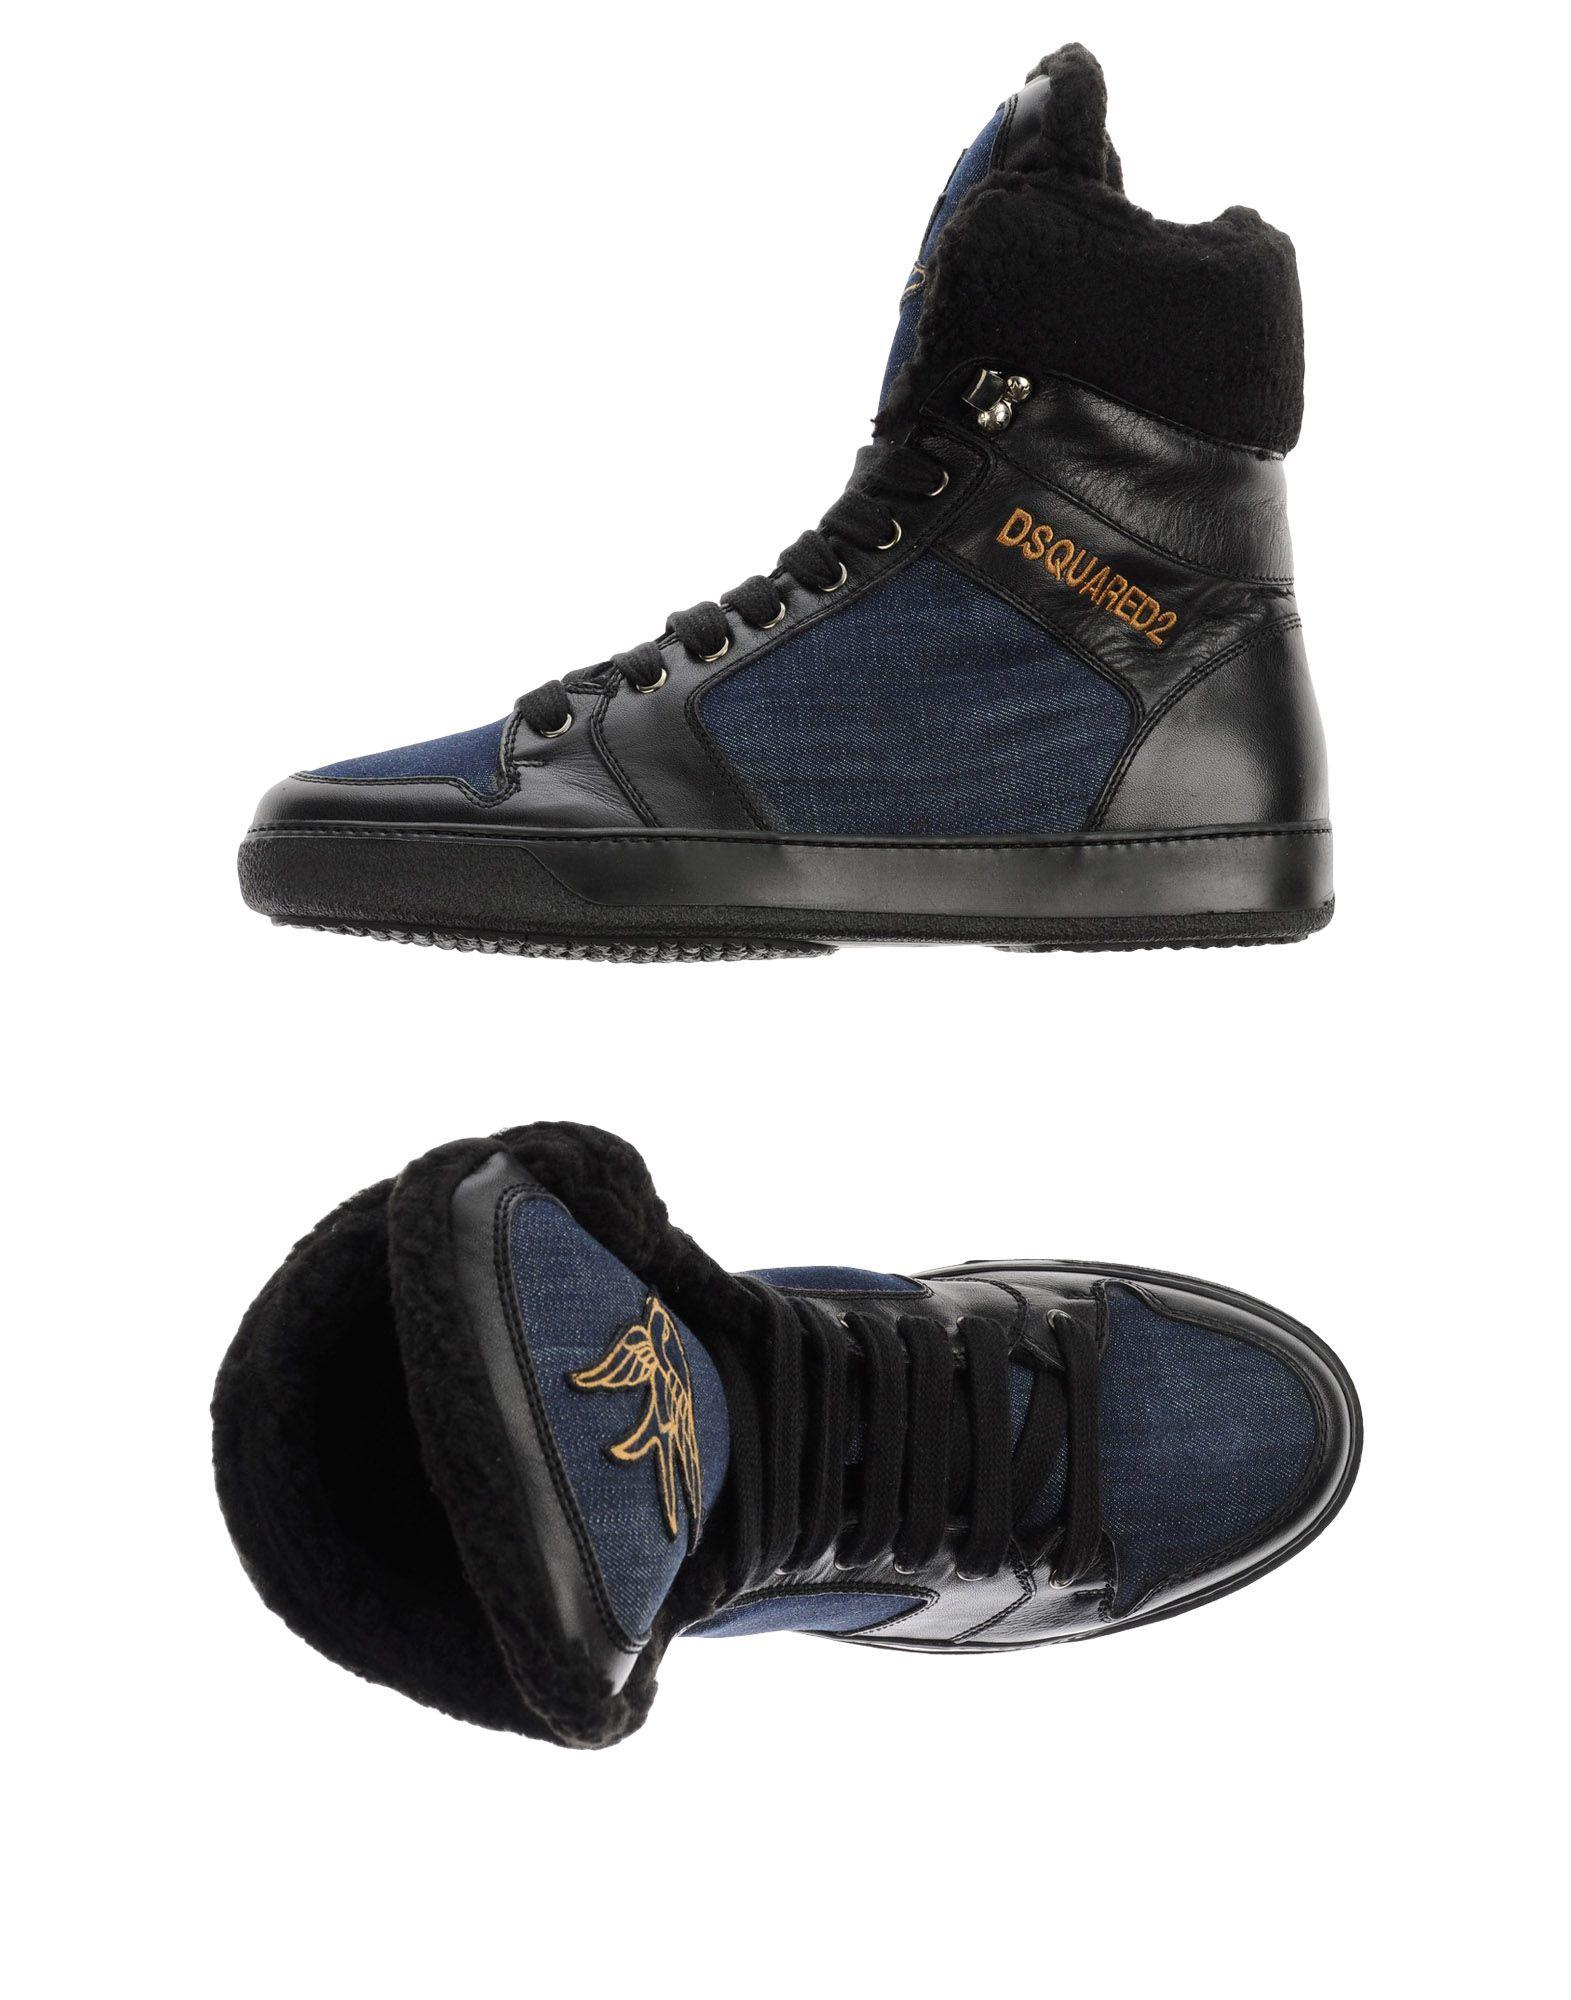 Dsquared2 Sneakers Herren  44907188TJ Schuhe Gute Qualität beliebte Schuhe 44907188TJ 70014e